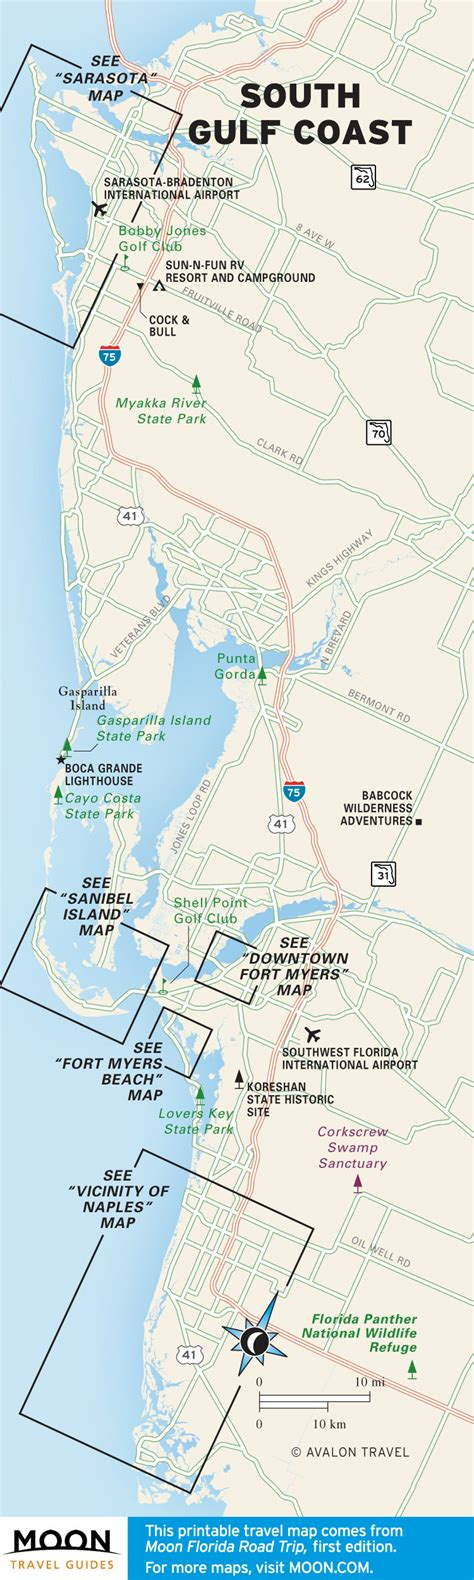 biloxi map travel map of the south gulf coast of florida